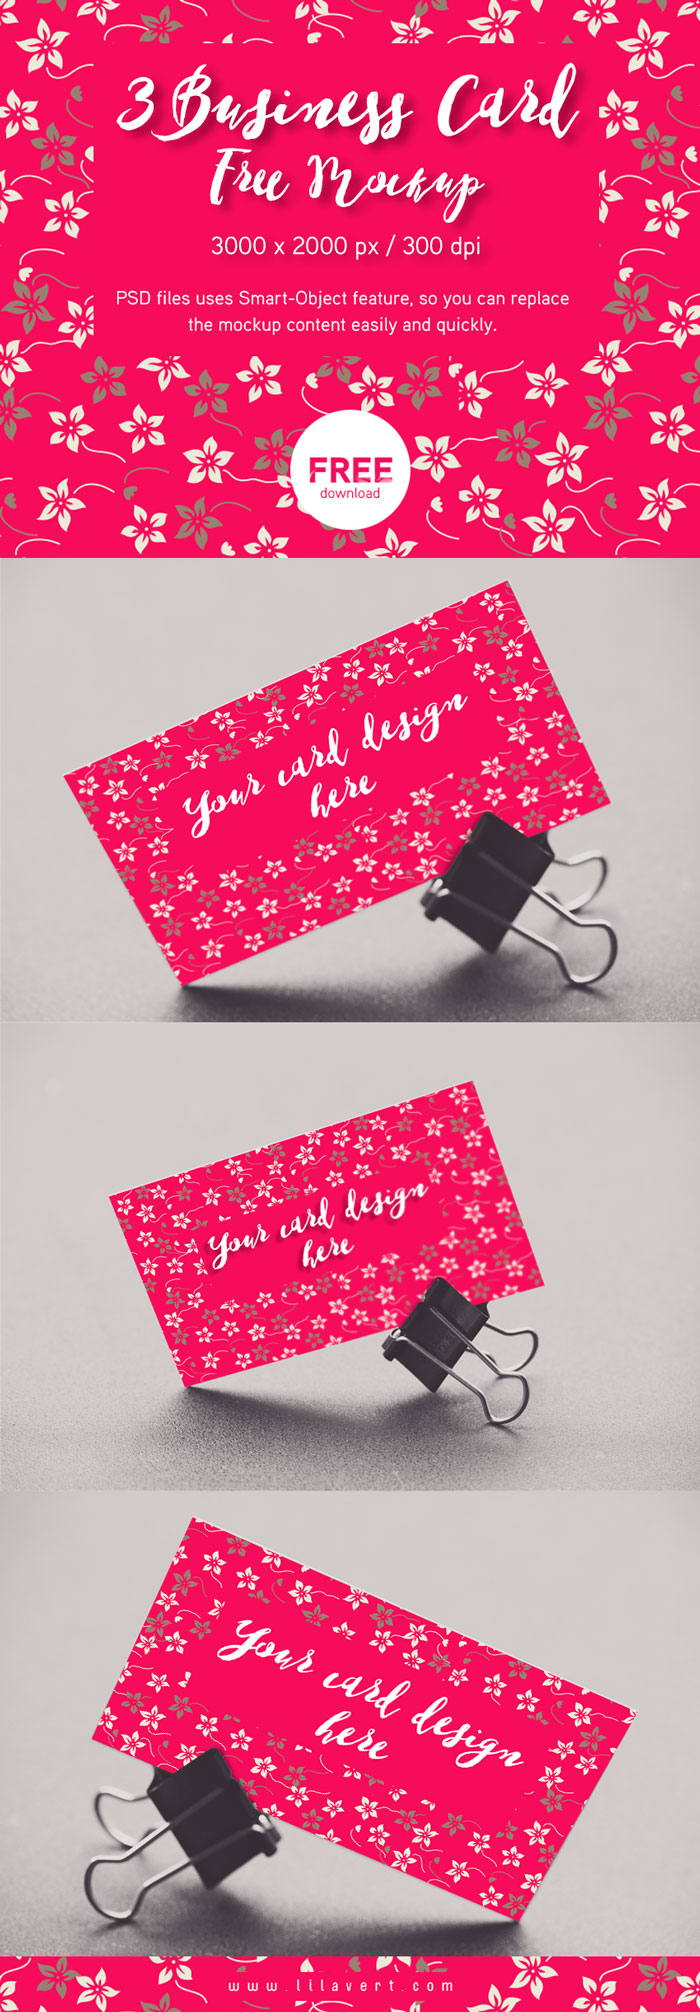 3 free business card mockup